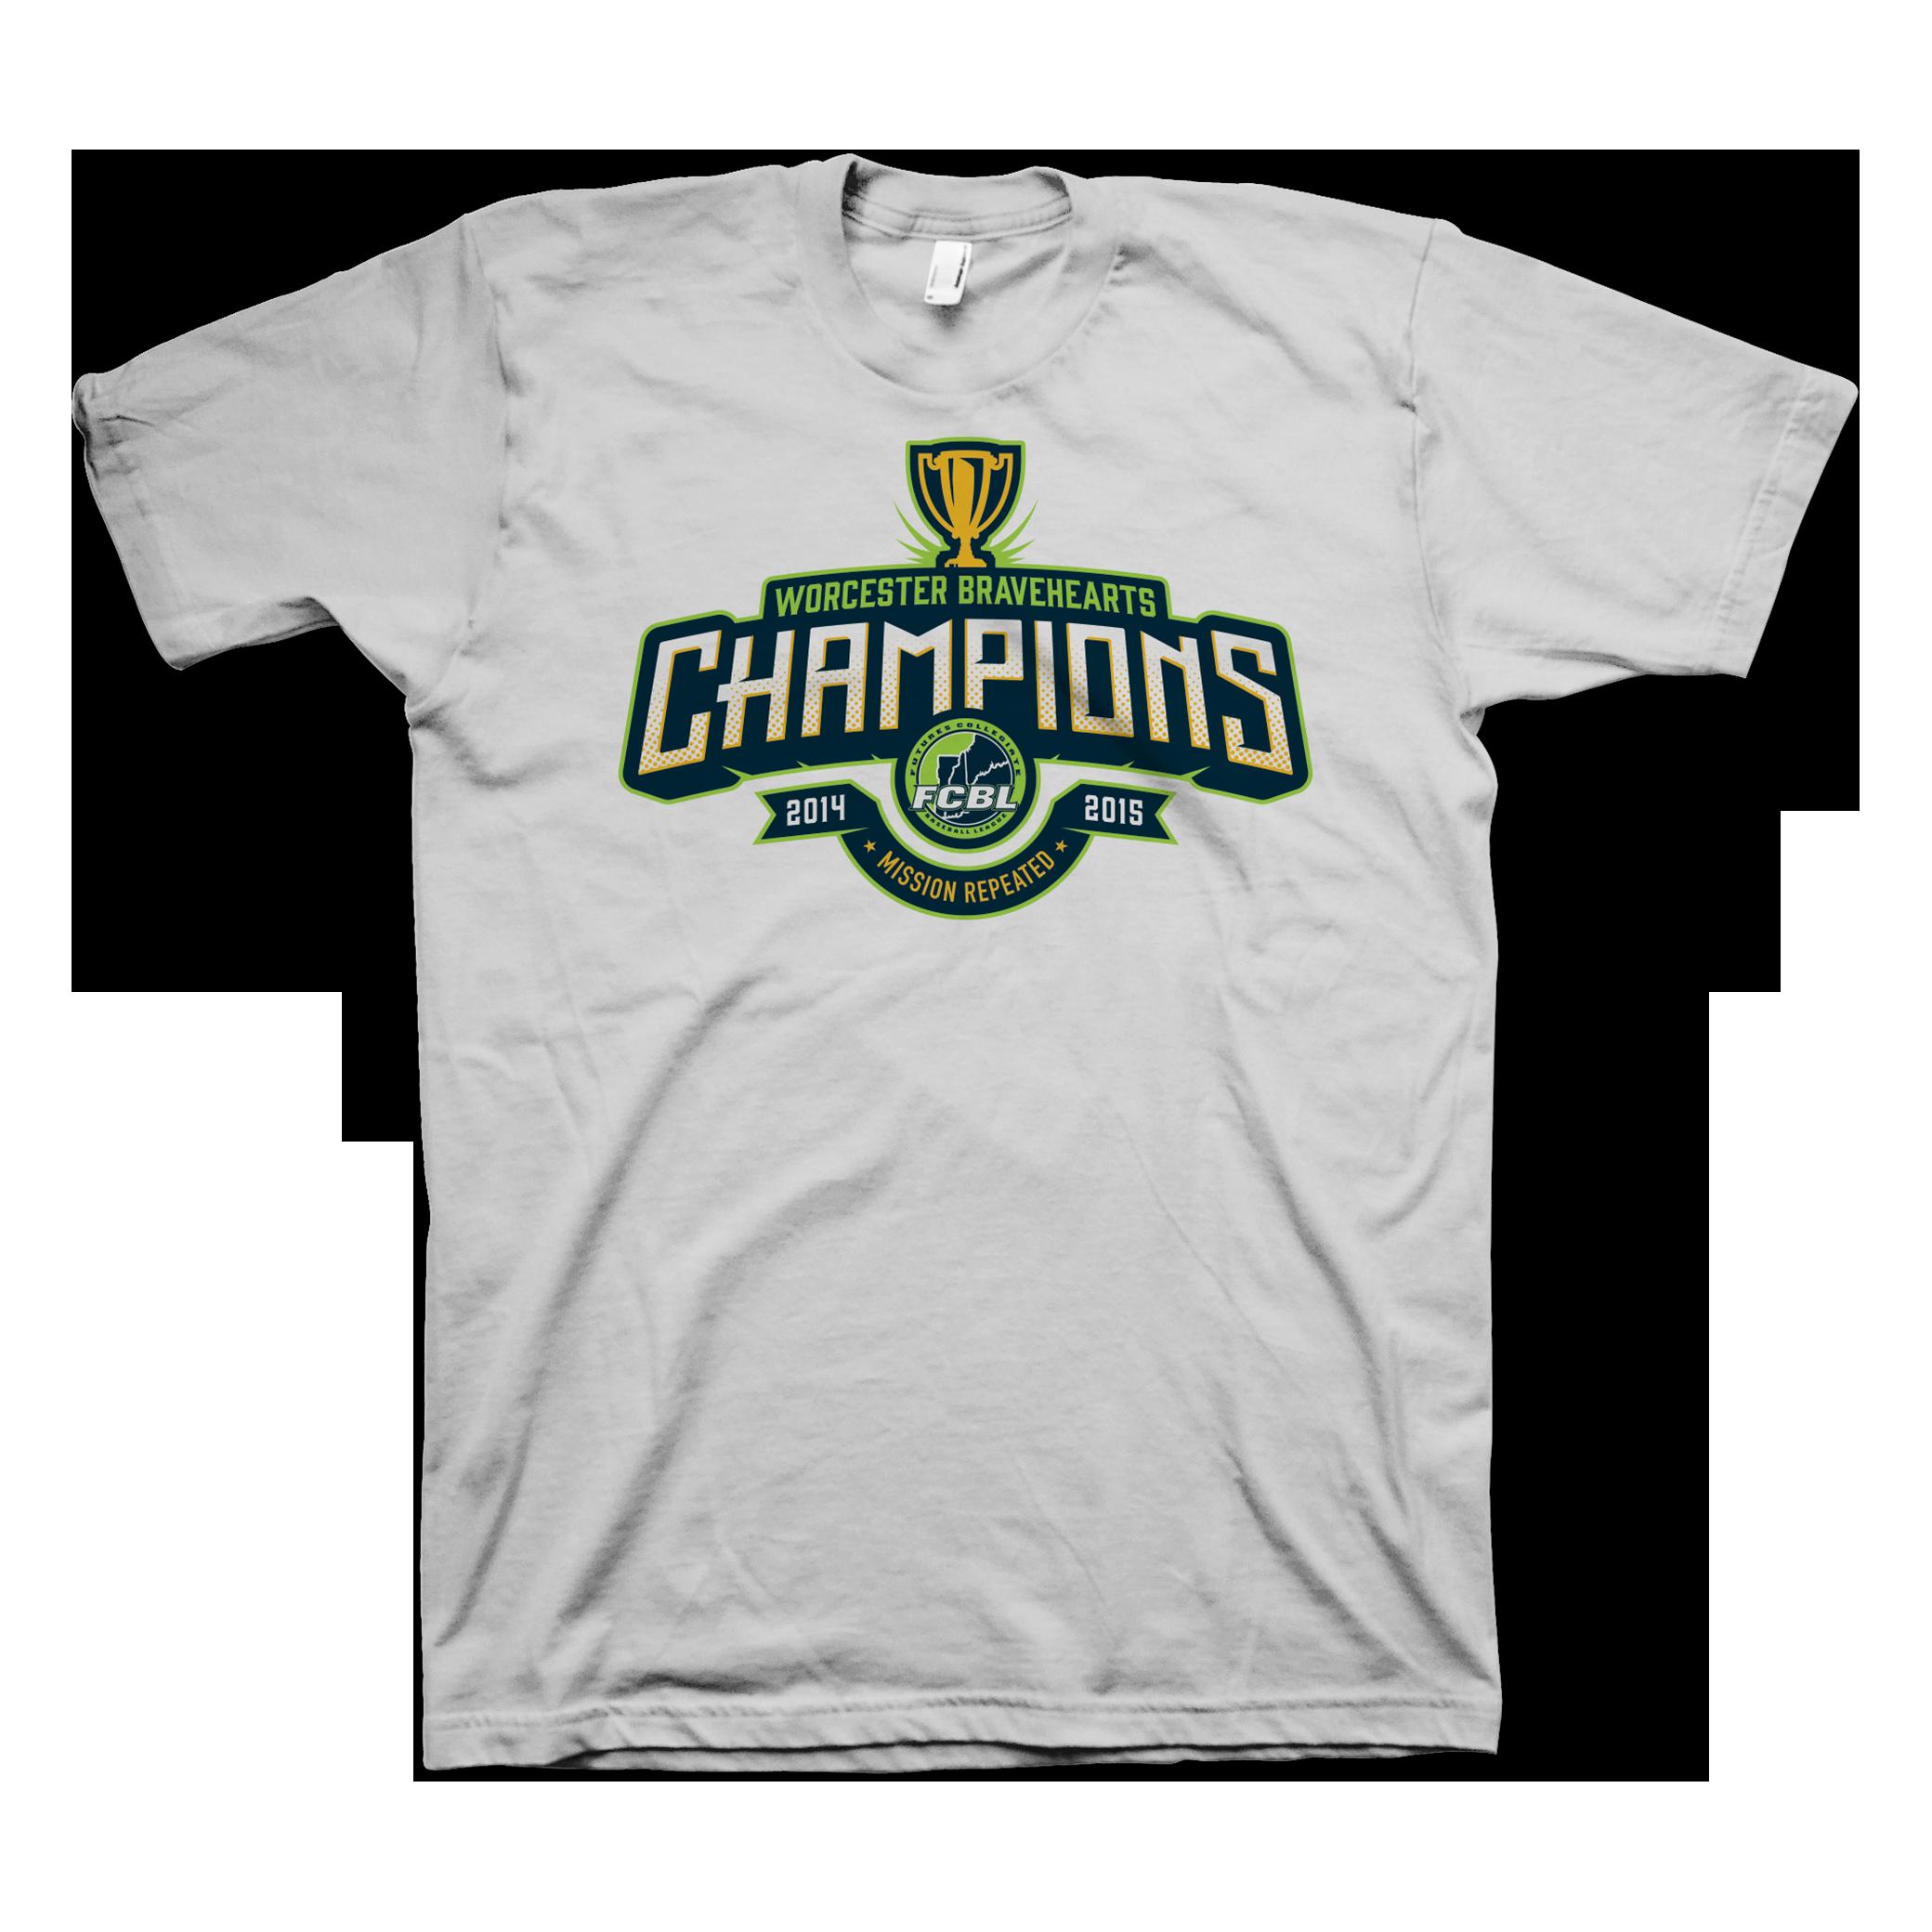 WB_Shirts_03.png